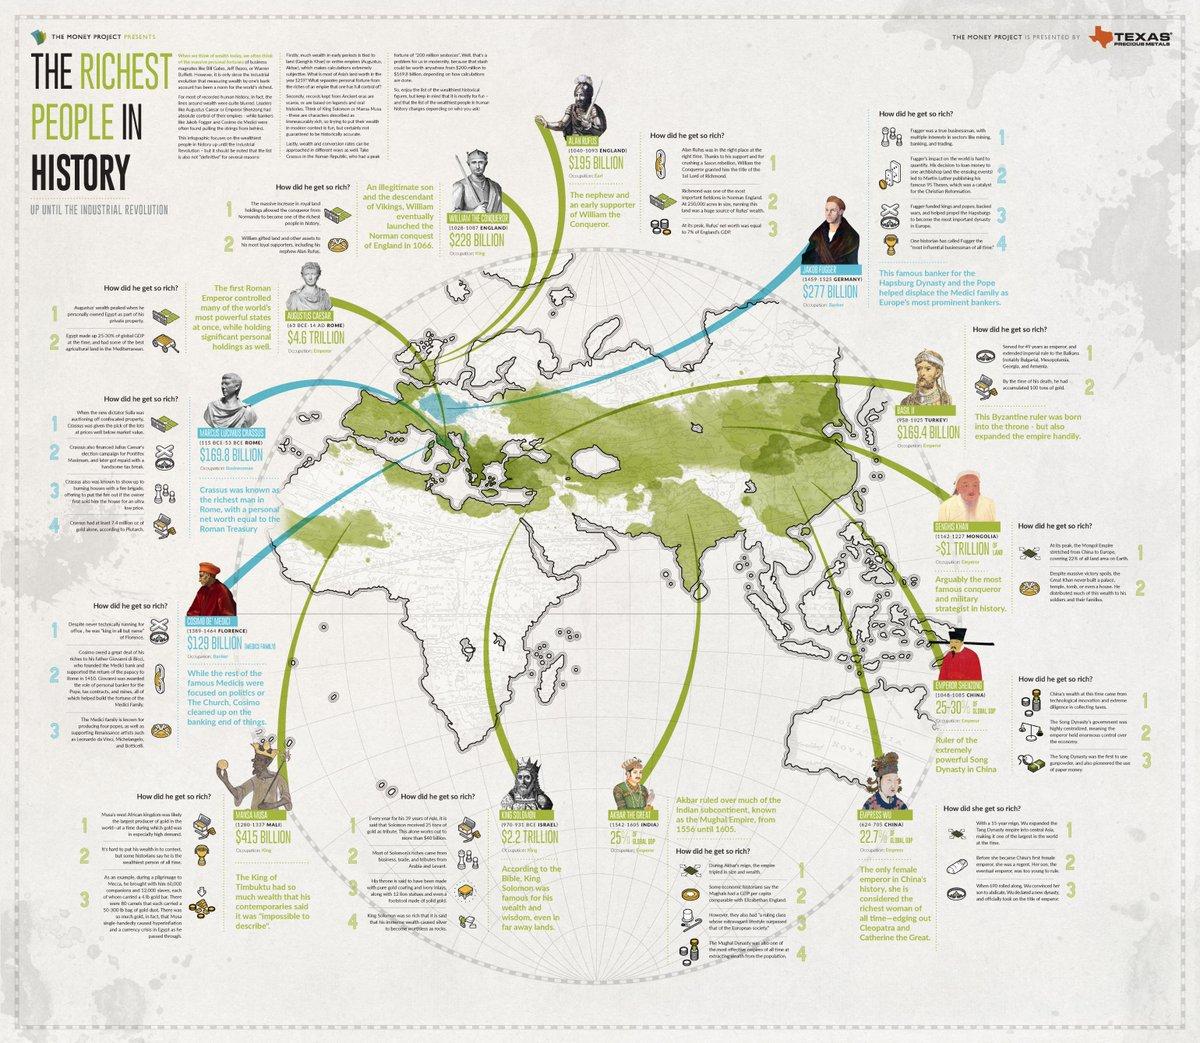 The Richest People in Human History. @VisualCap #economics #finance #fintech #defstar5 #makeyourownlane #Mpgvip   http:// money.visualcapitalist.com/richest-people -human-history/ &nbsp; … <br>http://pic.twitter.com/9cRsI52zfb